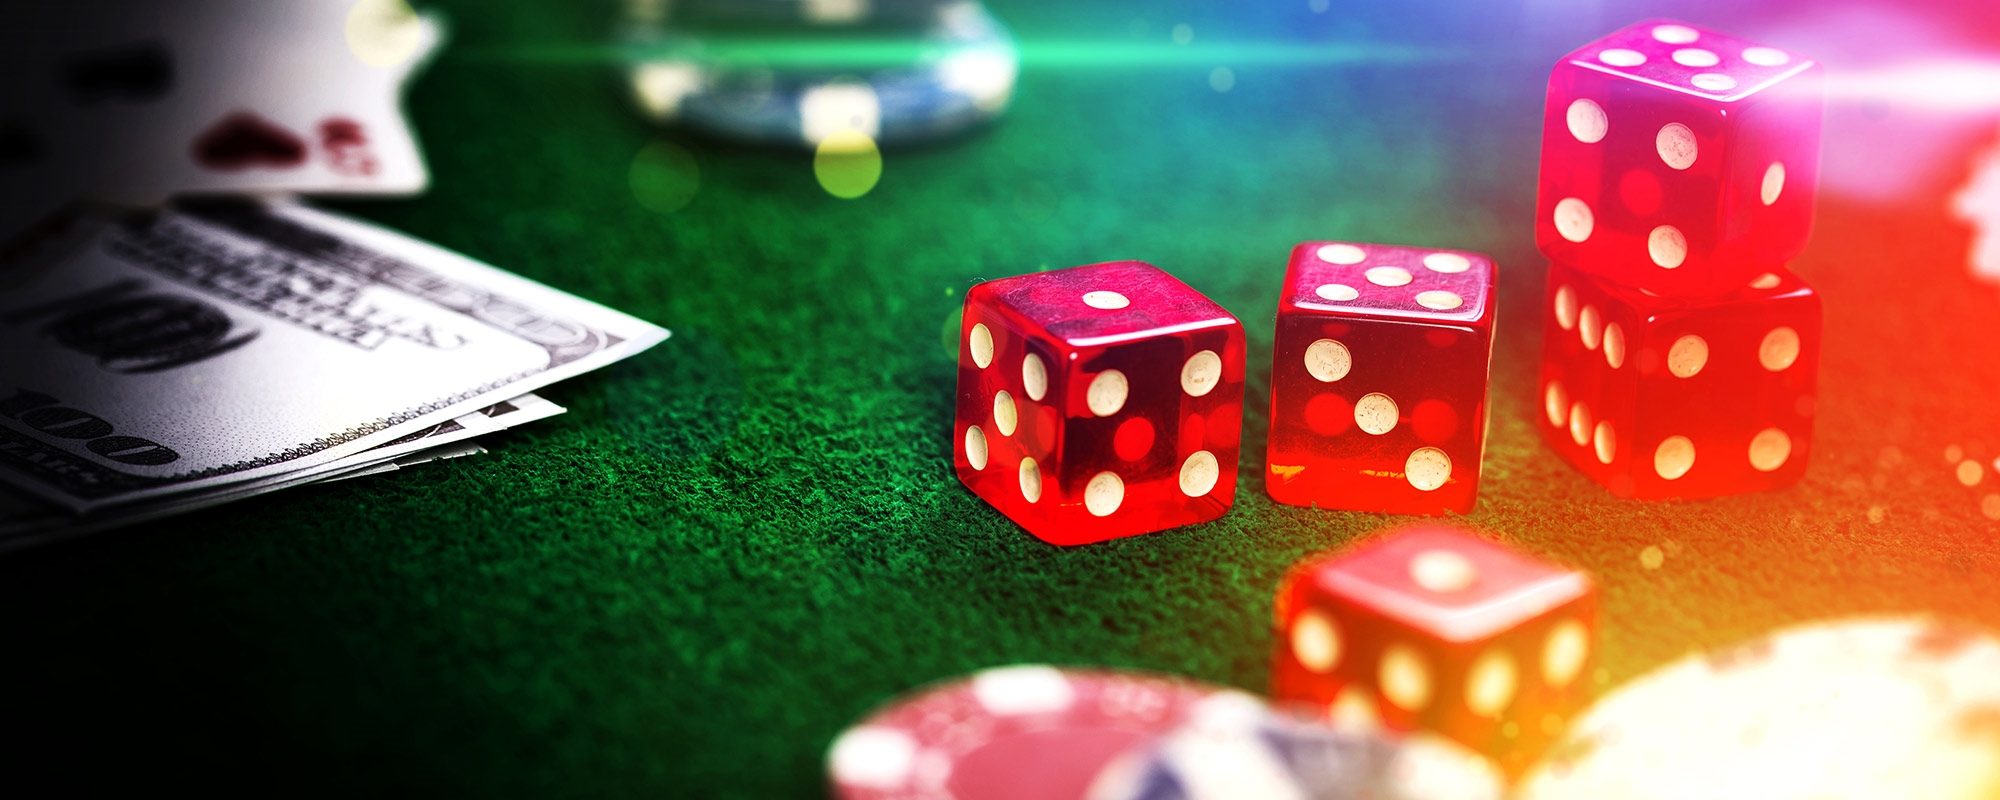 $2150 No deposit casino bonus at Gamebookers